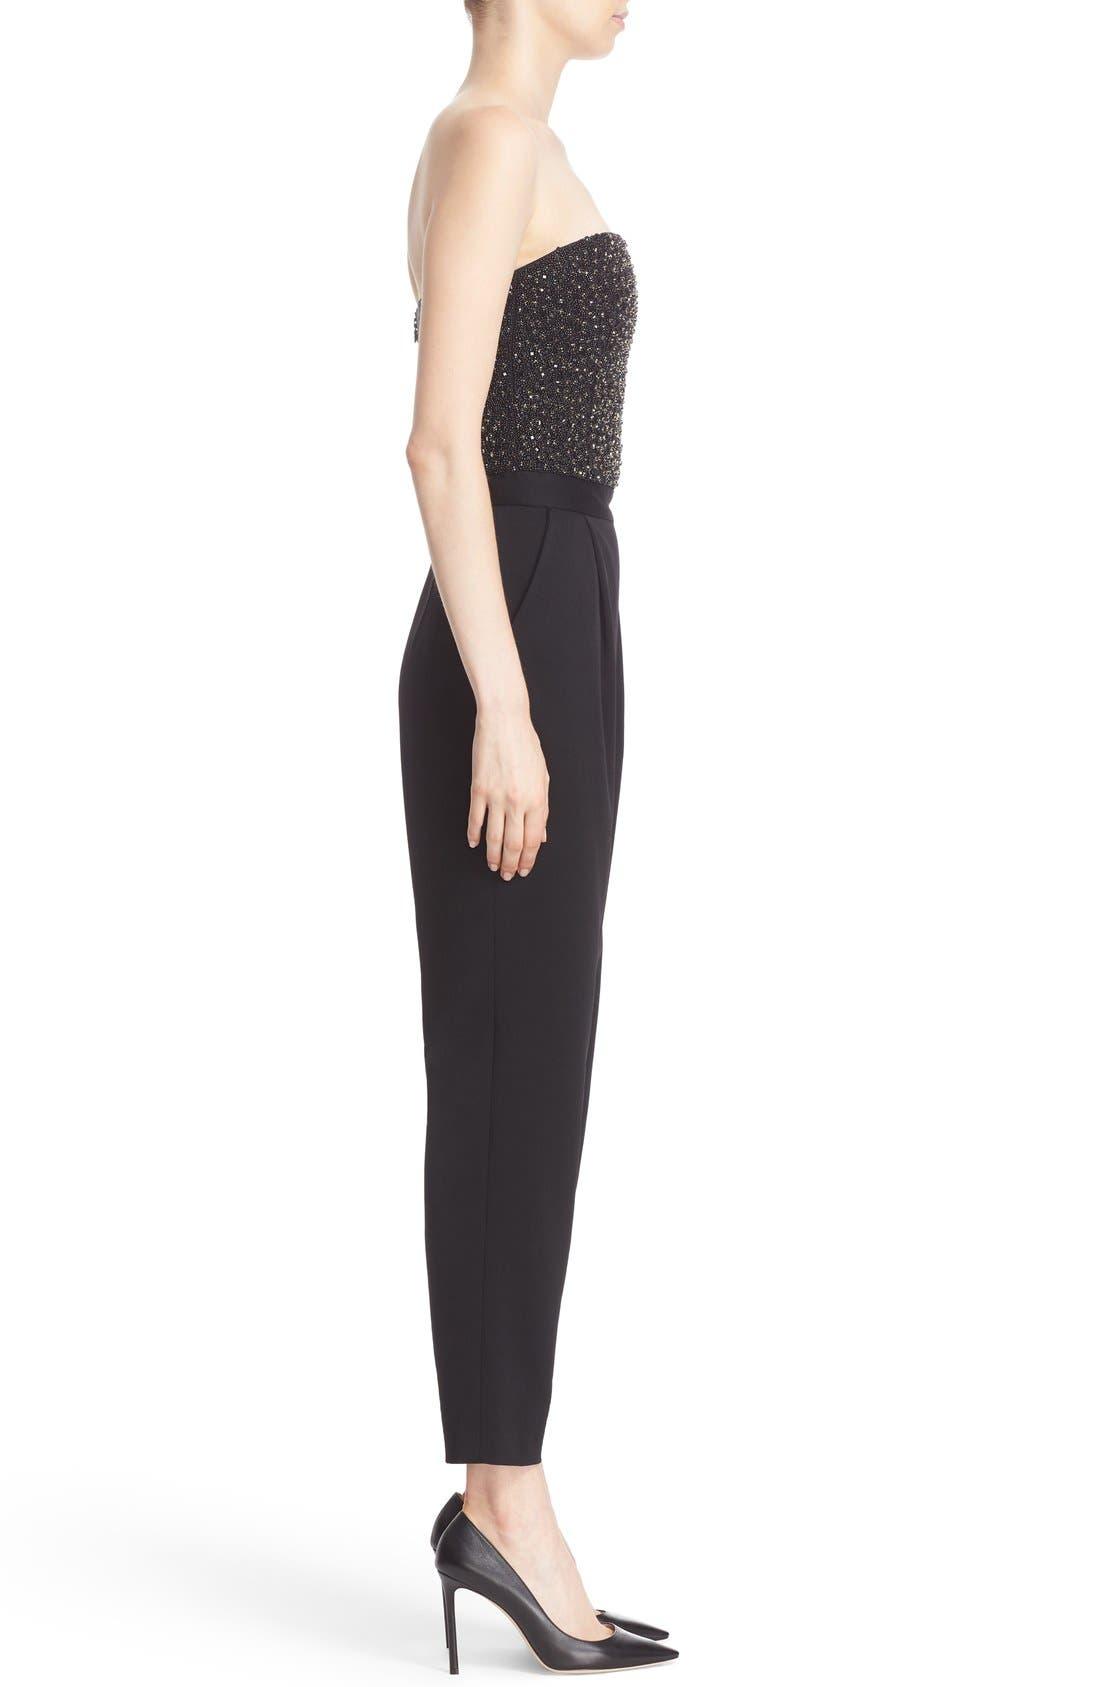 ALICE + OLIVIA,                             'Jeri' Beaded Bodice Strapless Jumpsuit,                             Alternate thumbnail 4, color,                             001